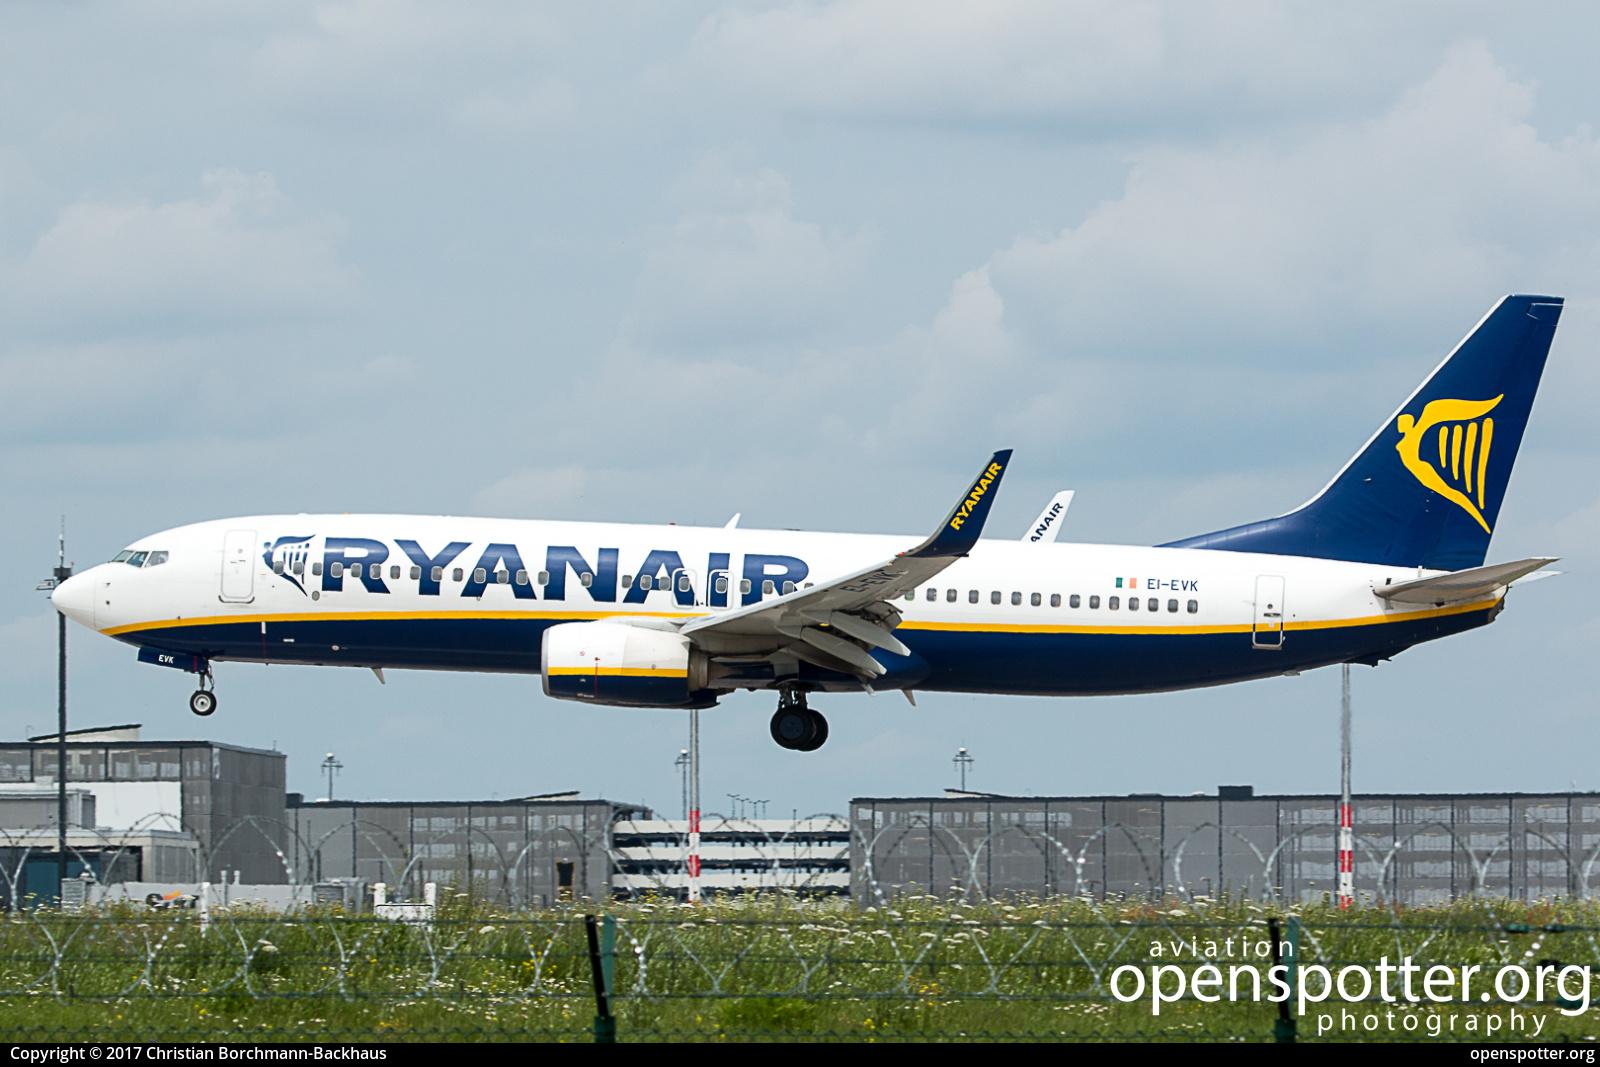 EI-EVK - Ryanair Boeing 737-8AS(WL) at Berlin-Schönefeld International Airport (SXF/EDDB) taken by Christian Borchmann-Backhaus | openspotter.org | ID: 44521